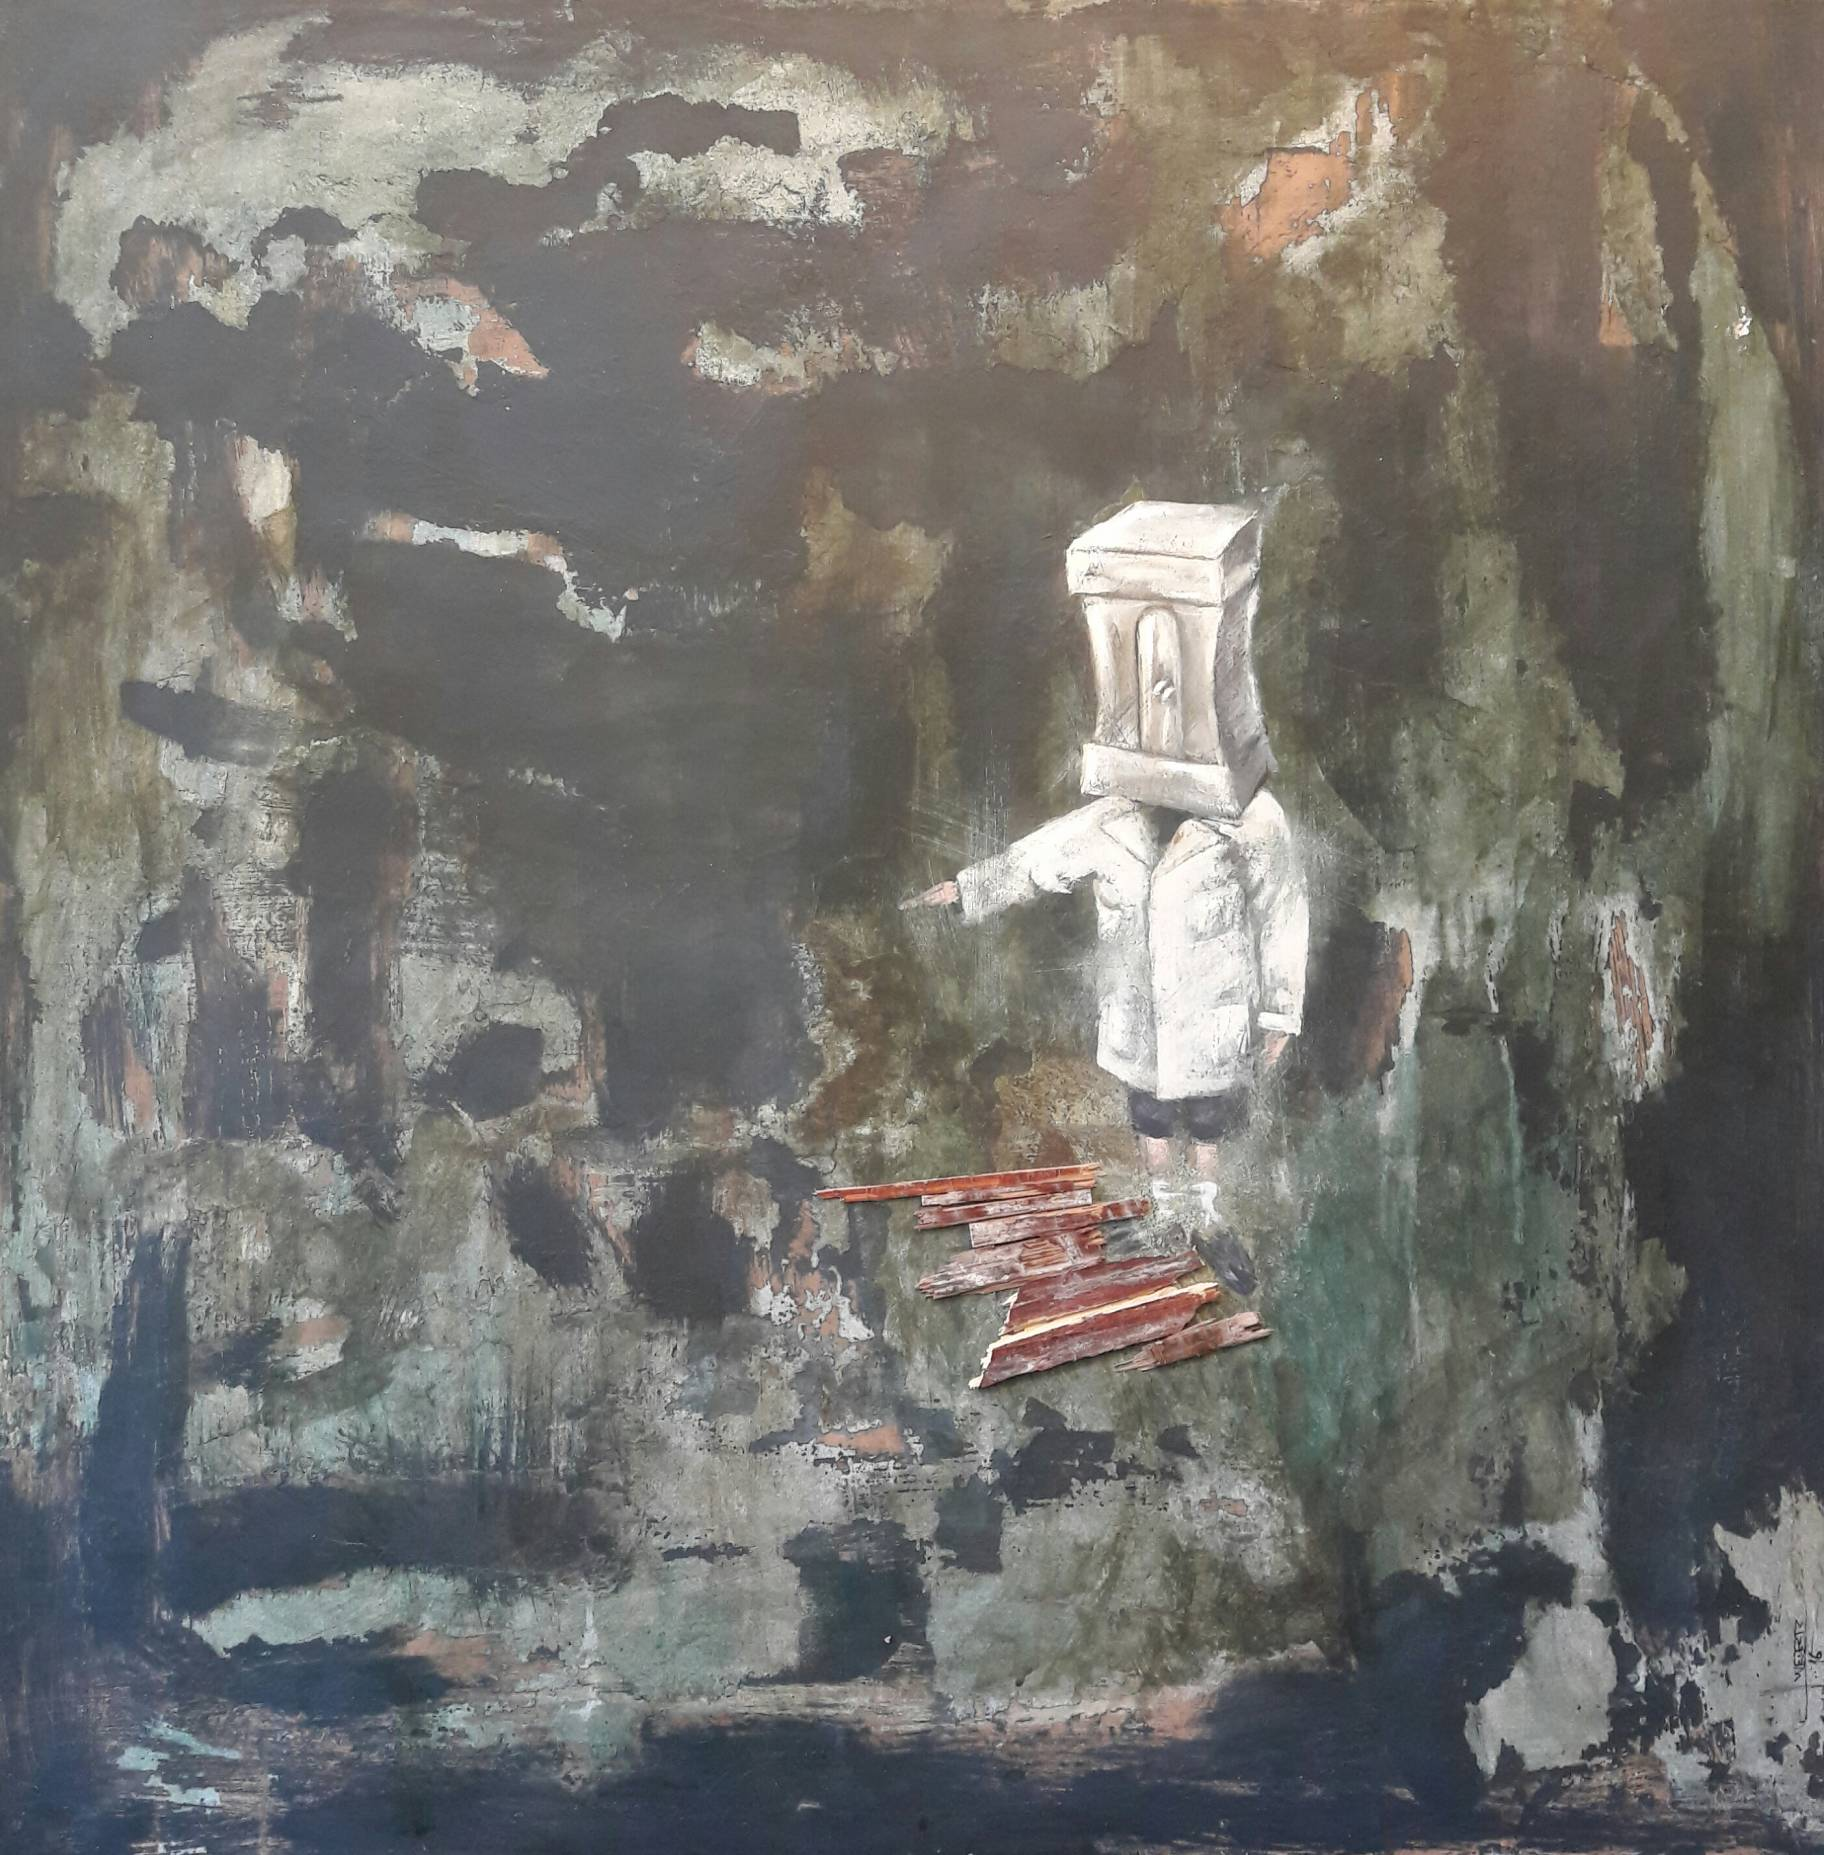 AFINANDO EL LÀPIZ (2016) - Gustavo Wedertz